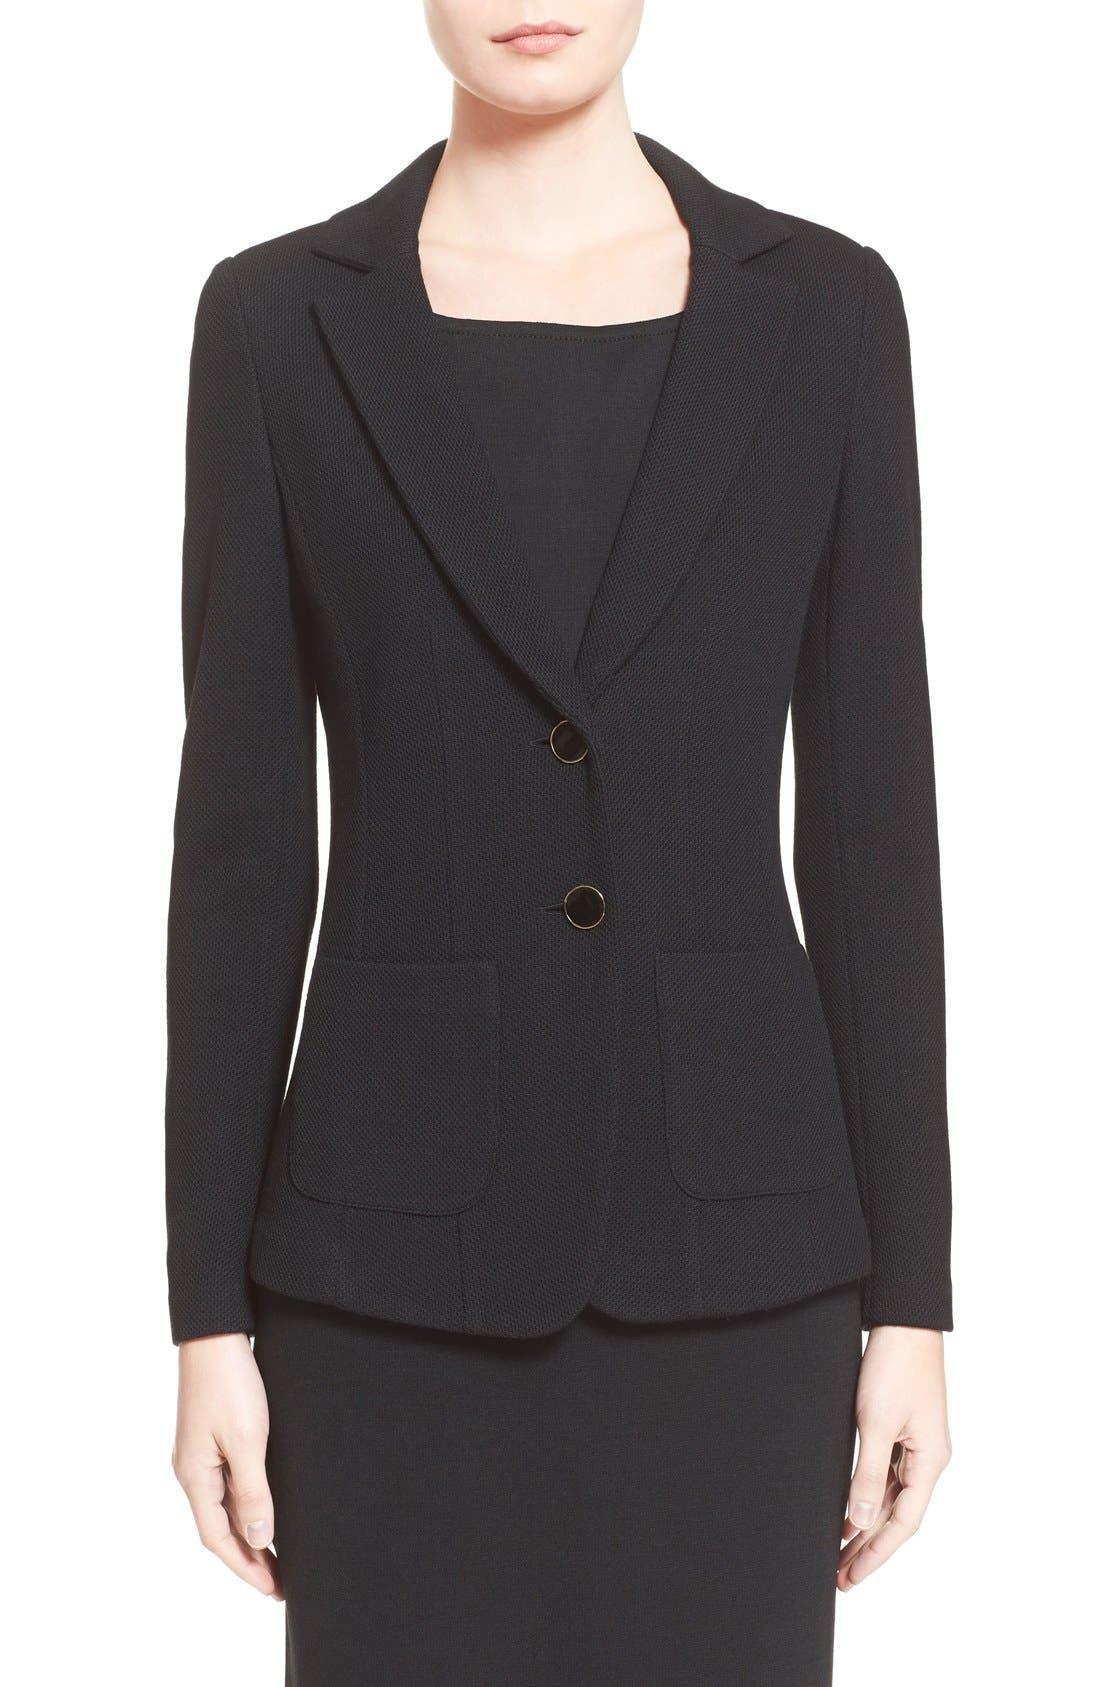 Milano Piqué Knit Jacket,                         Main,                         color, CAVIAR